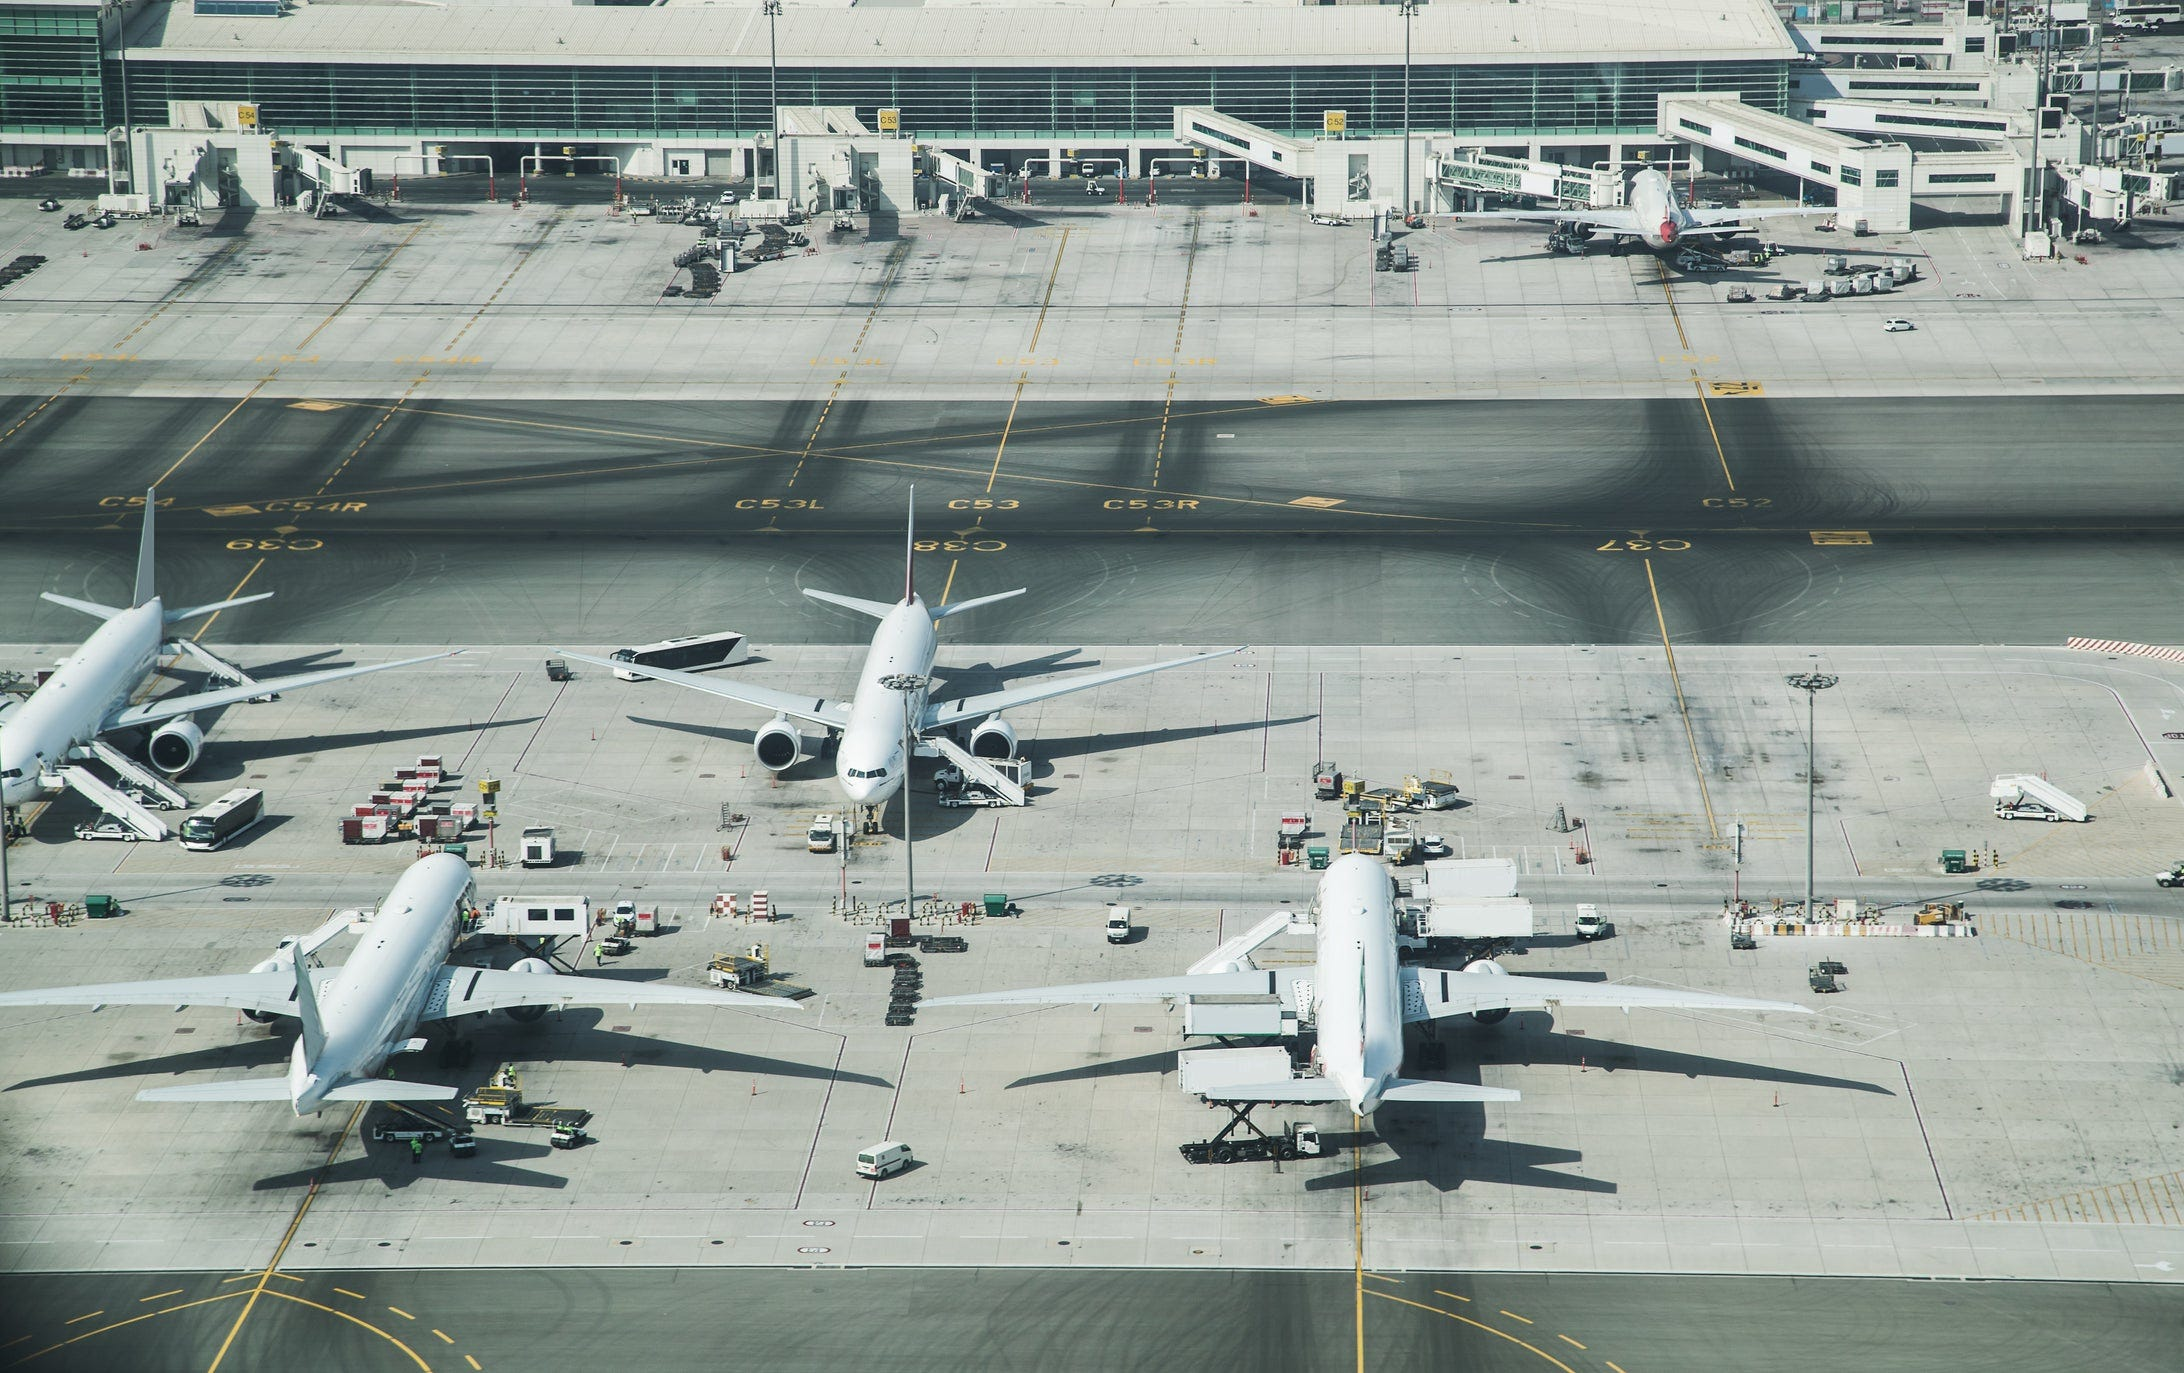 Coronavirus stimulus: How airlines, hotels, cruise lines fared